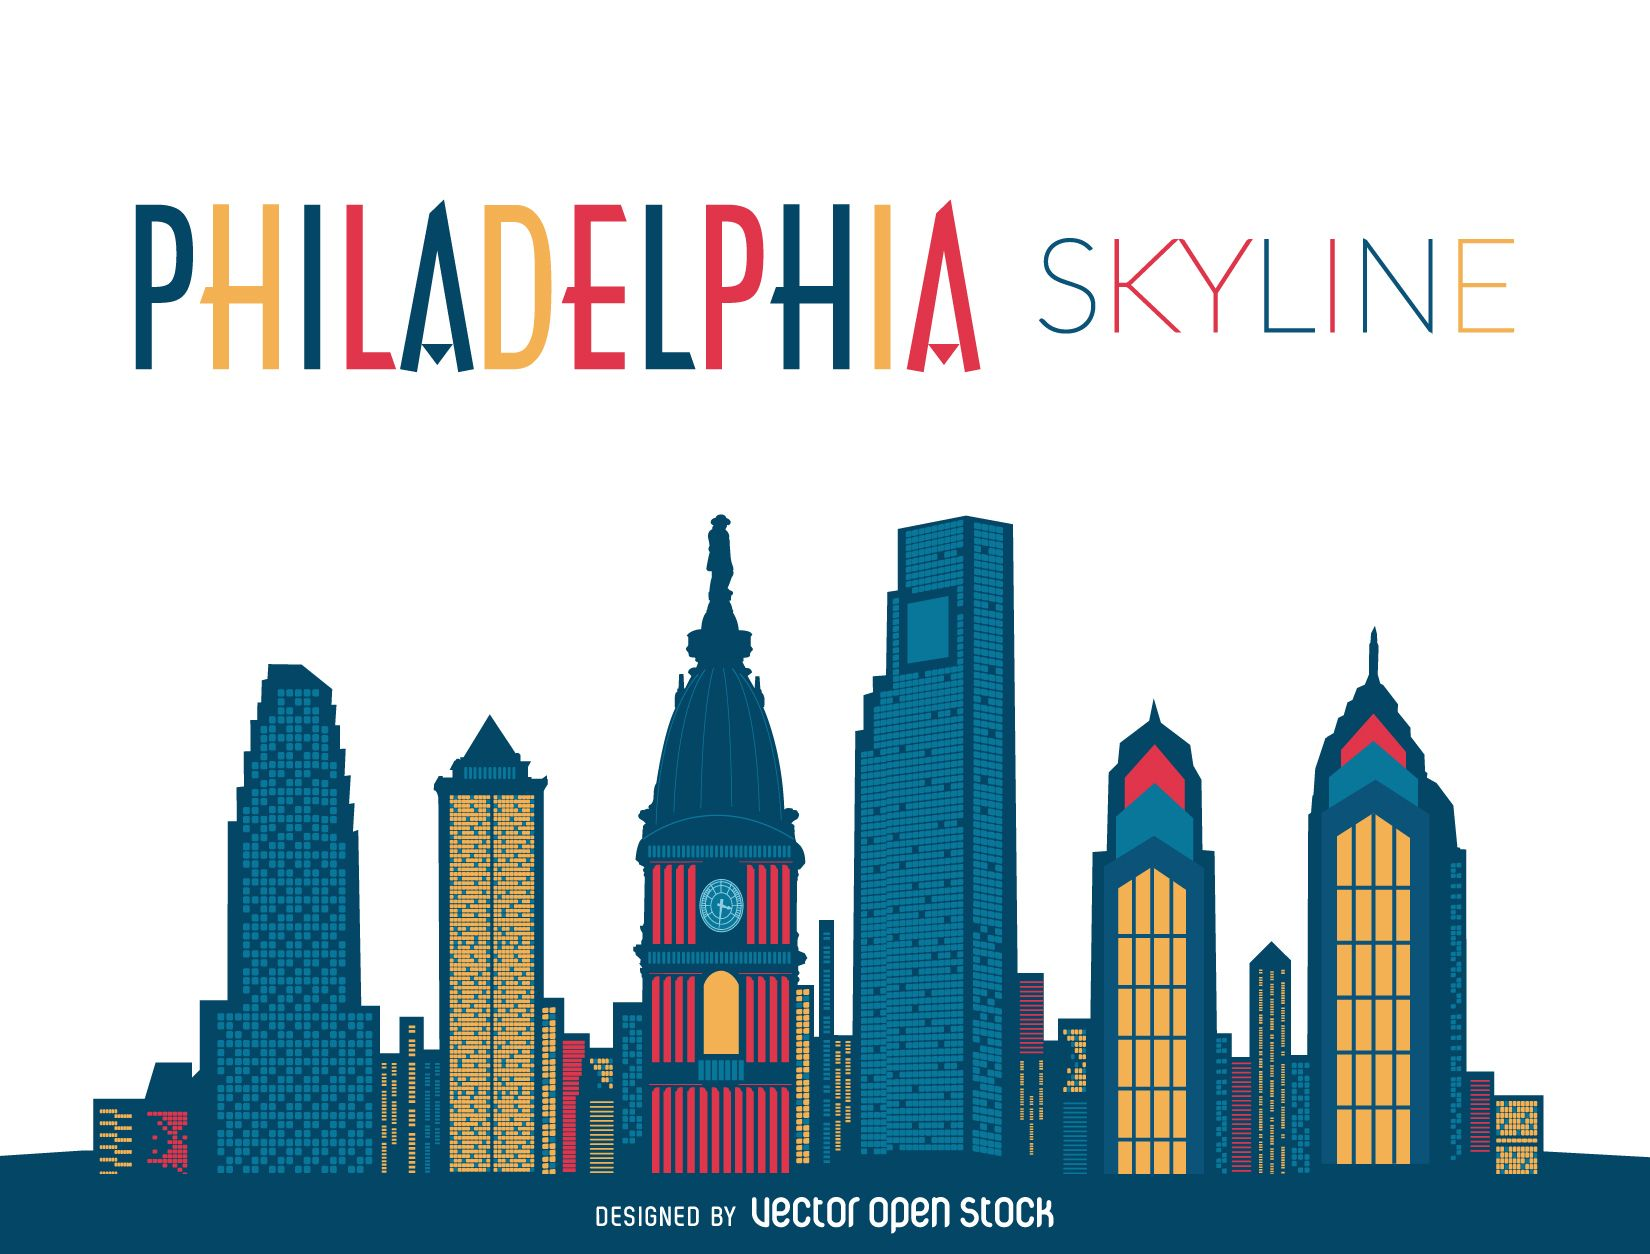 1650x1254 Modern And Flat Illustration Featuring Philadelphia Skyline